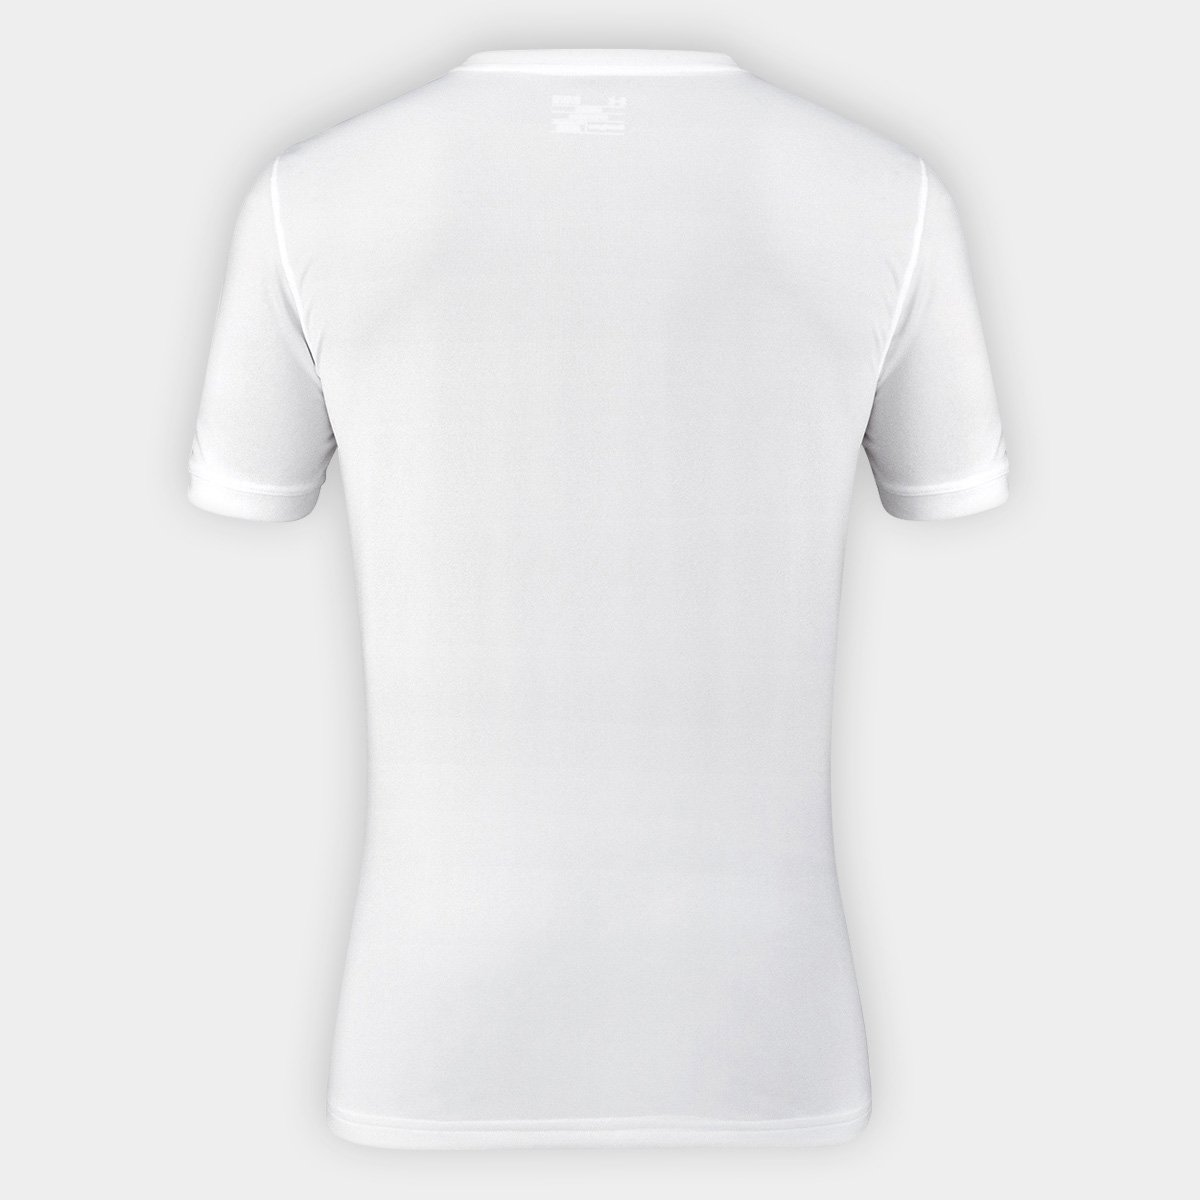 cc9890351b Camisa Fluminense II 17 18 s nº Torcedor Under Armour Masculina ...